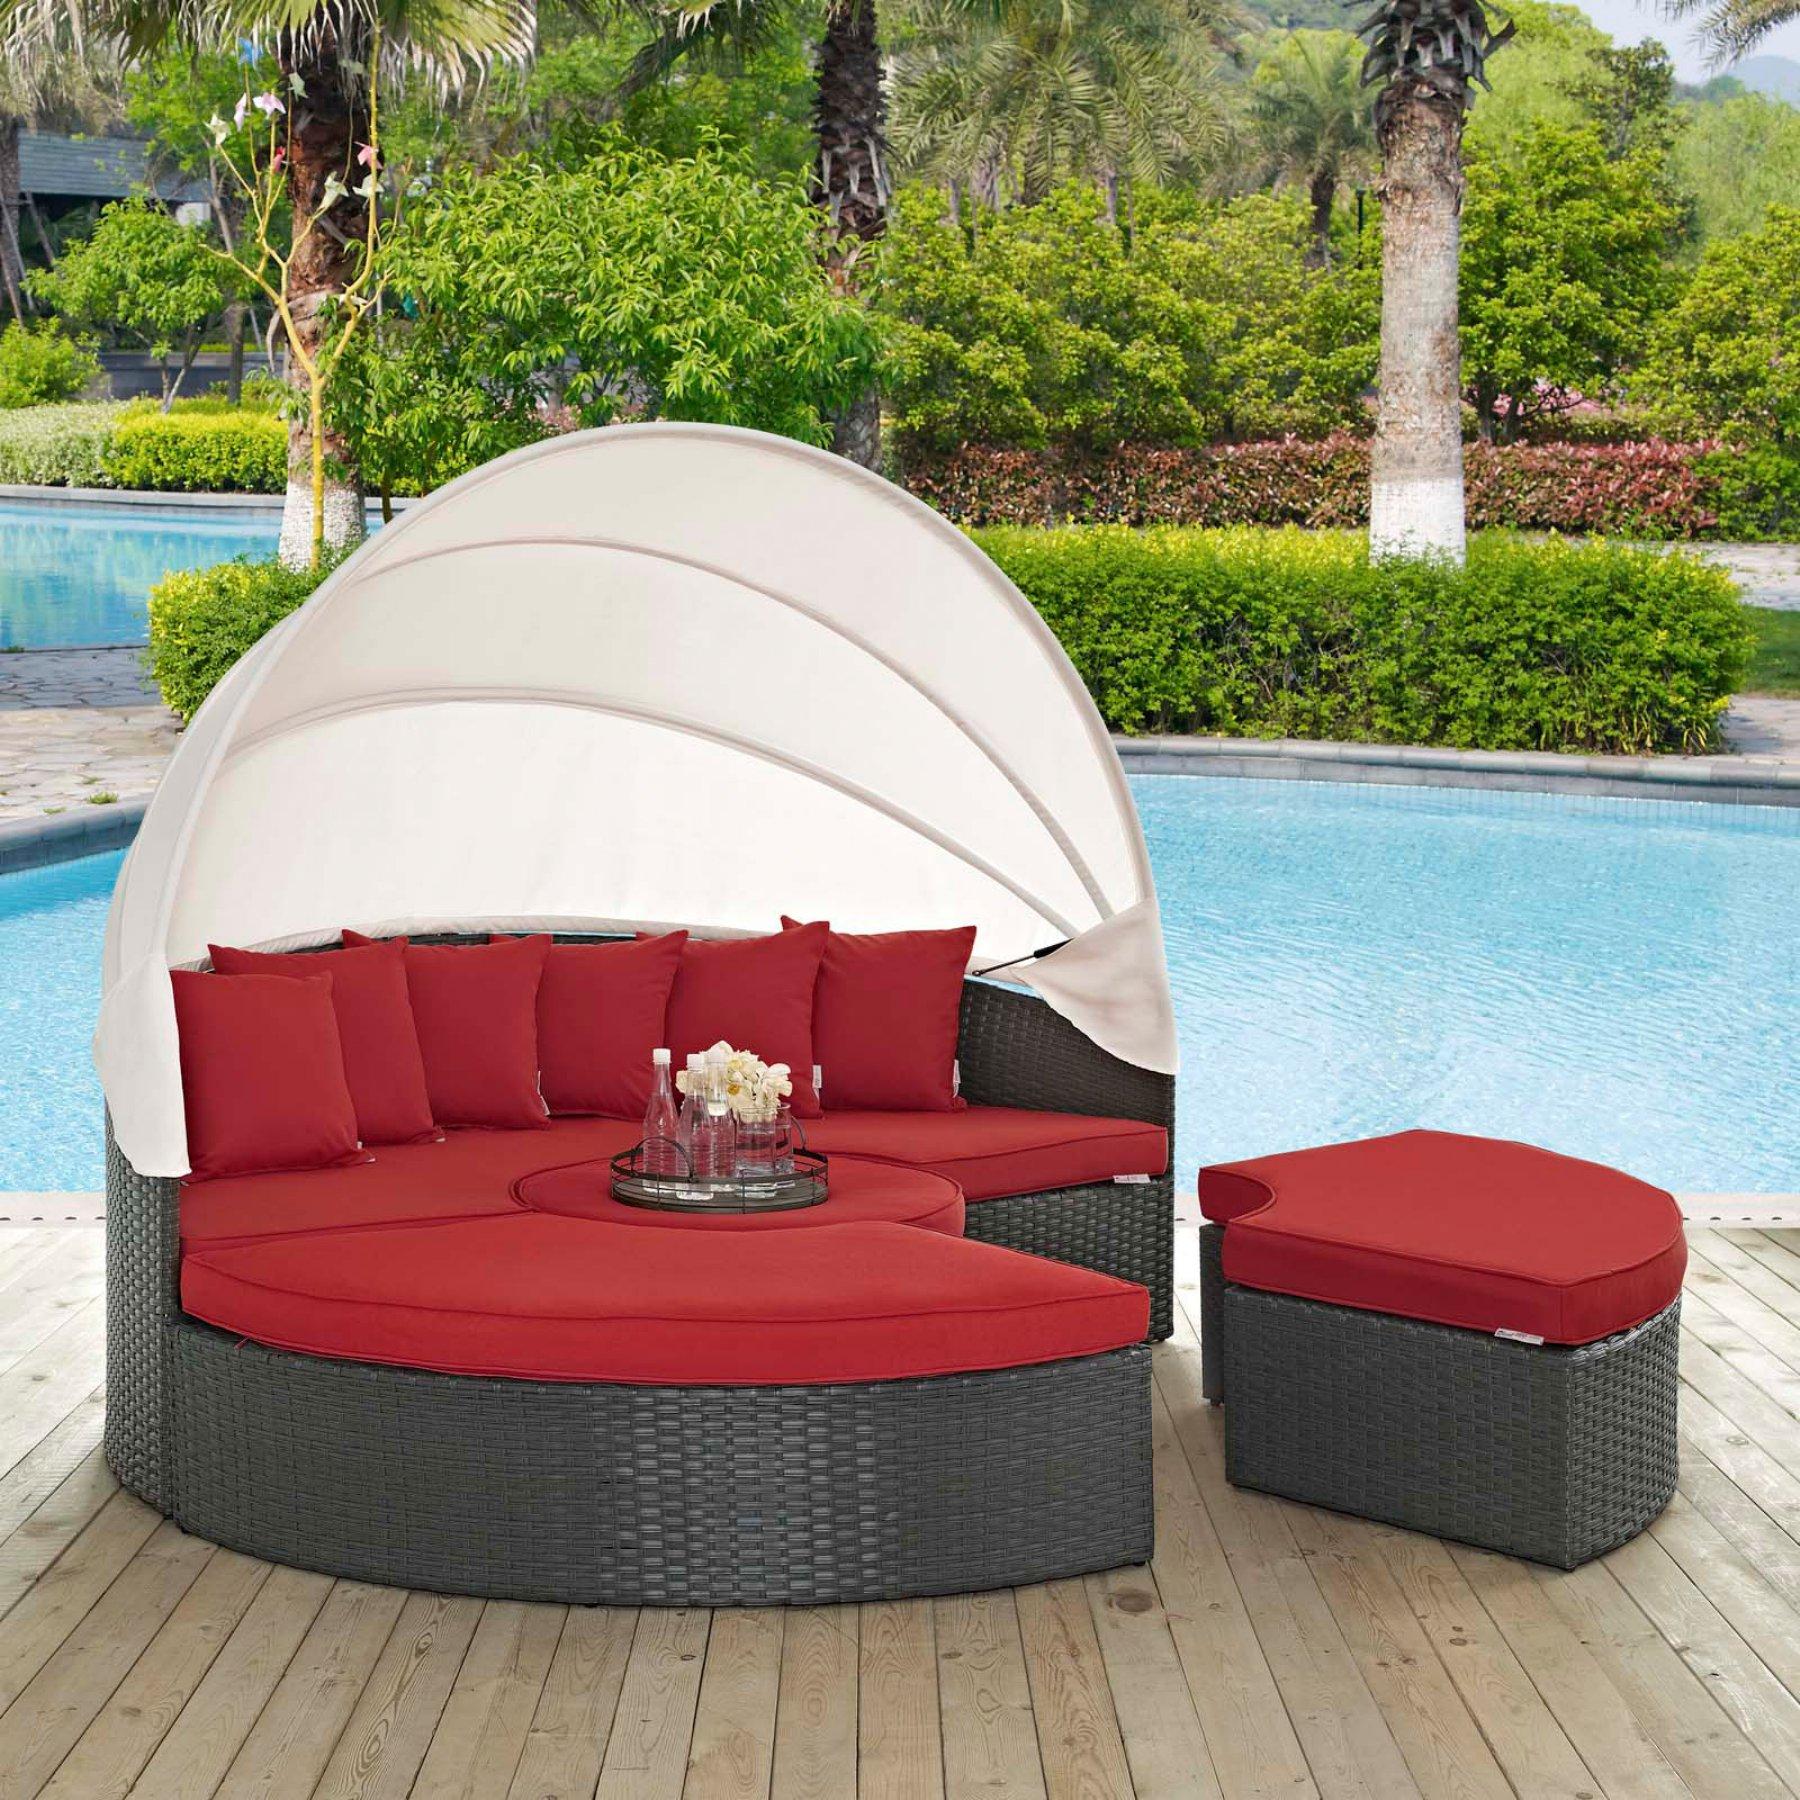 Outdoor Daybed Sunbrella